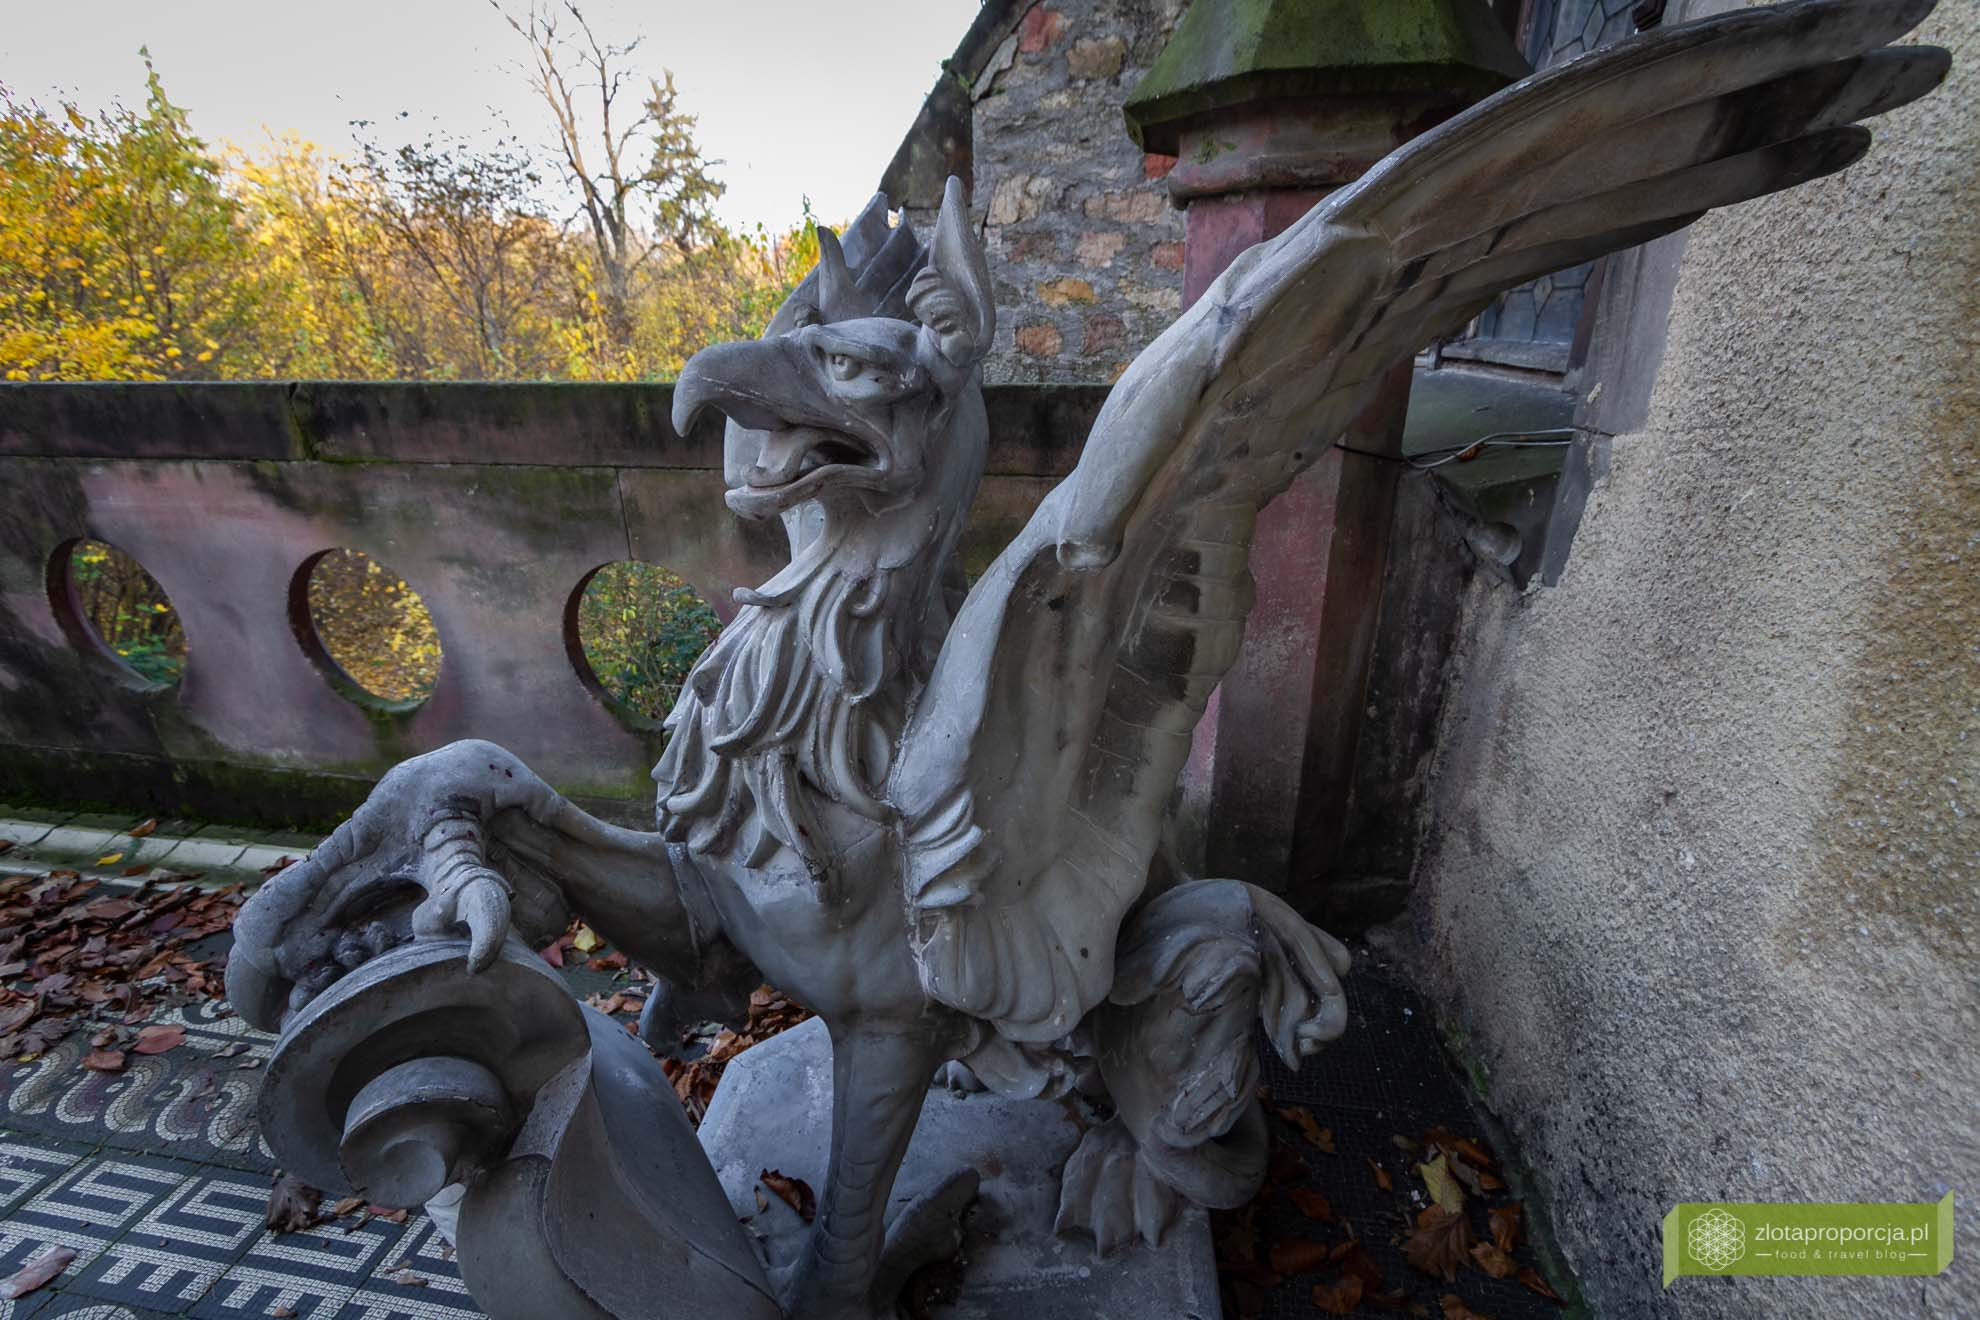 sleza_3828, Ślęża, Masyw Ślęży, Sobótka, Zamek Górka